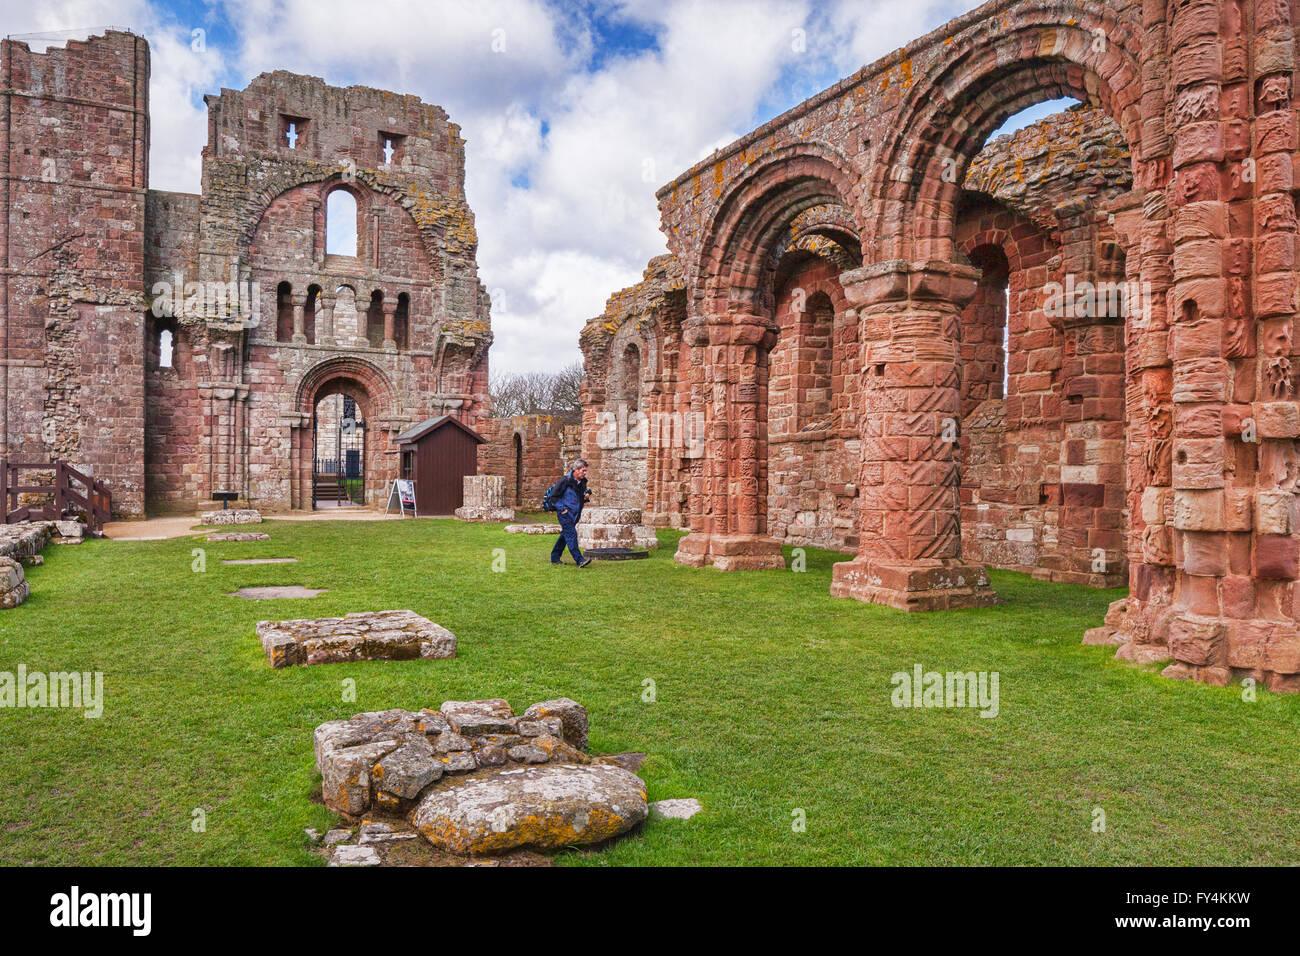 Besucher in den Ruinen von Lindisfarne Priory, Holy Island, Northumberland, England, UK Stockbild